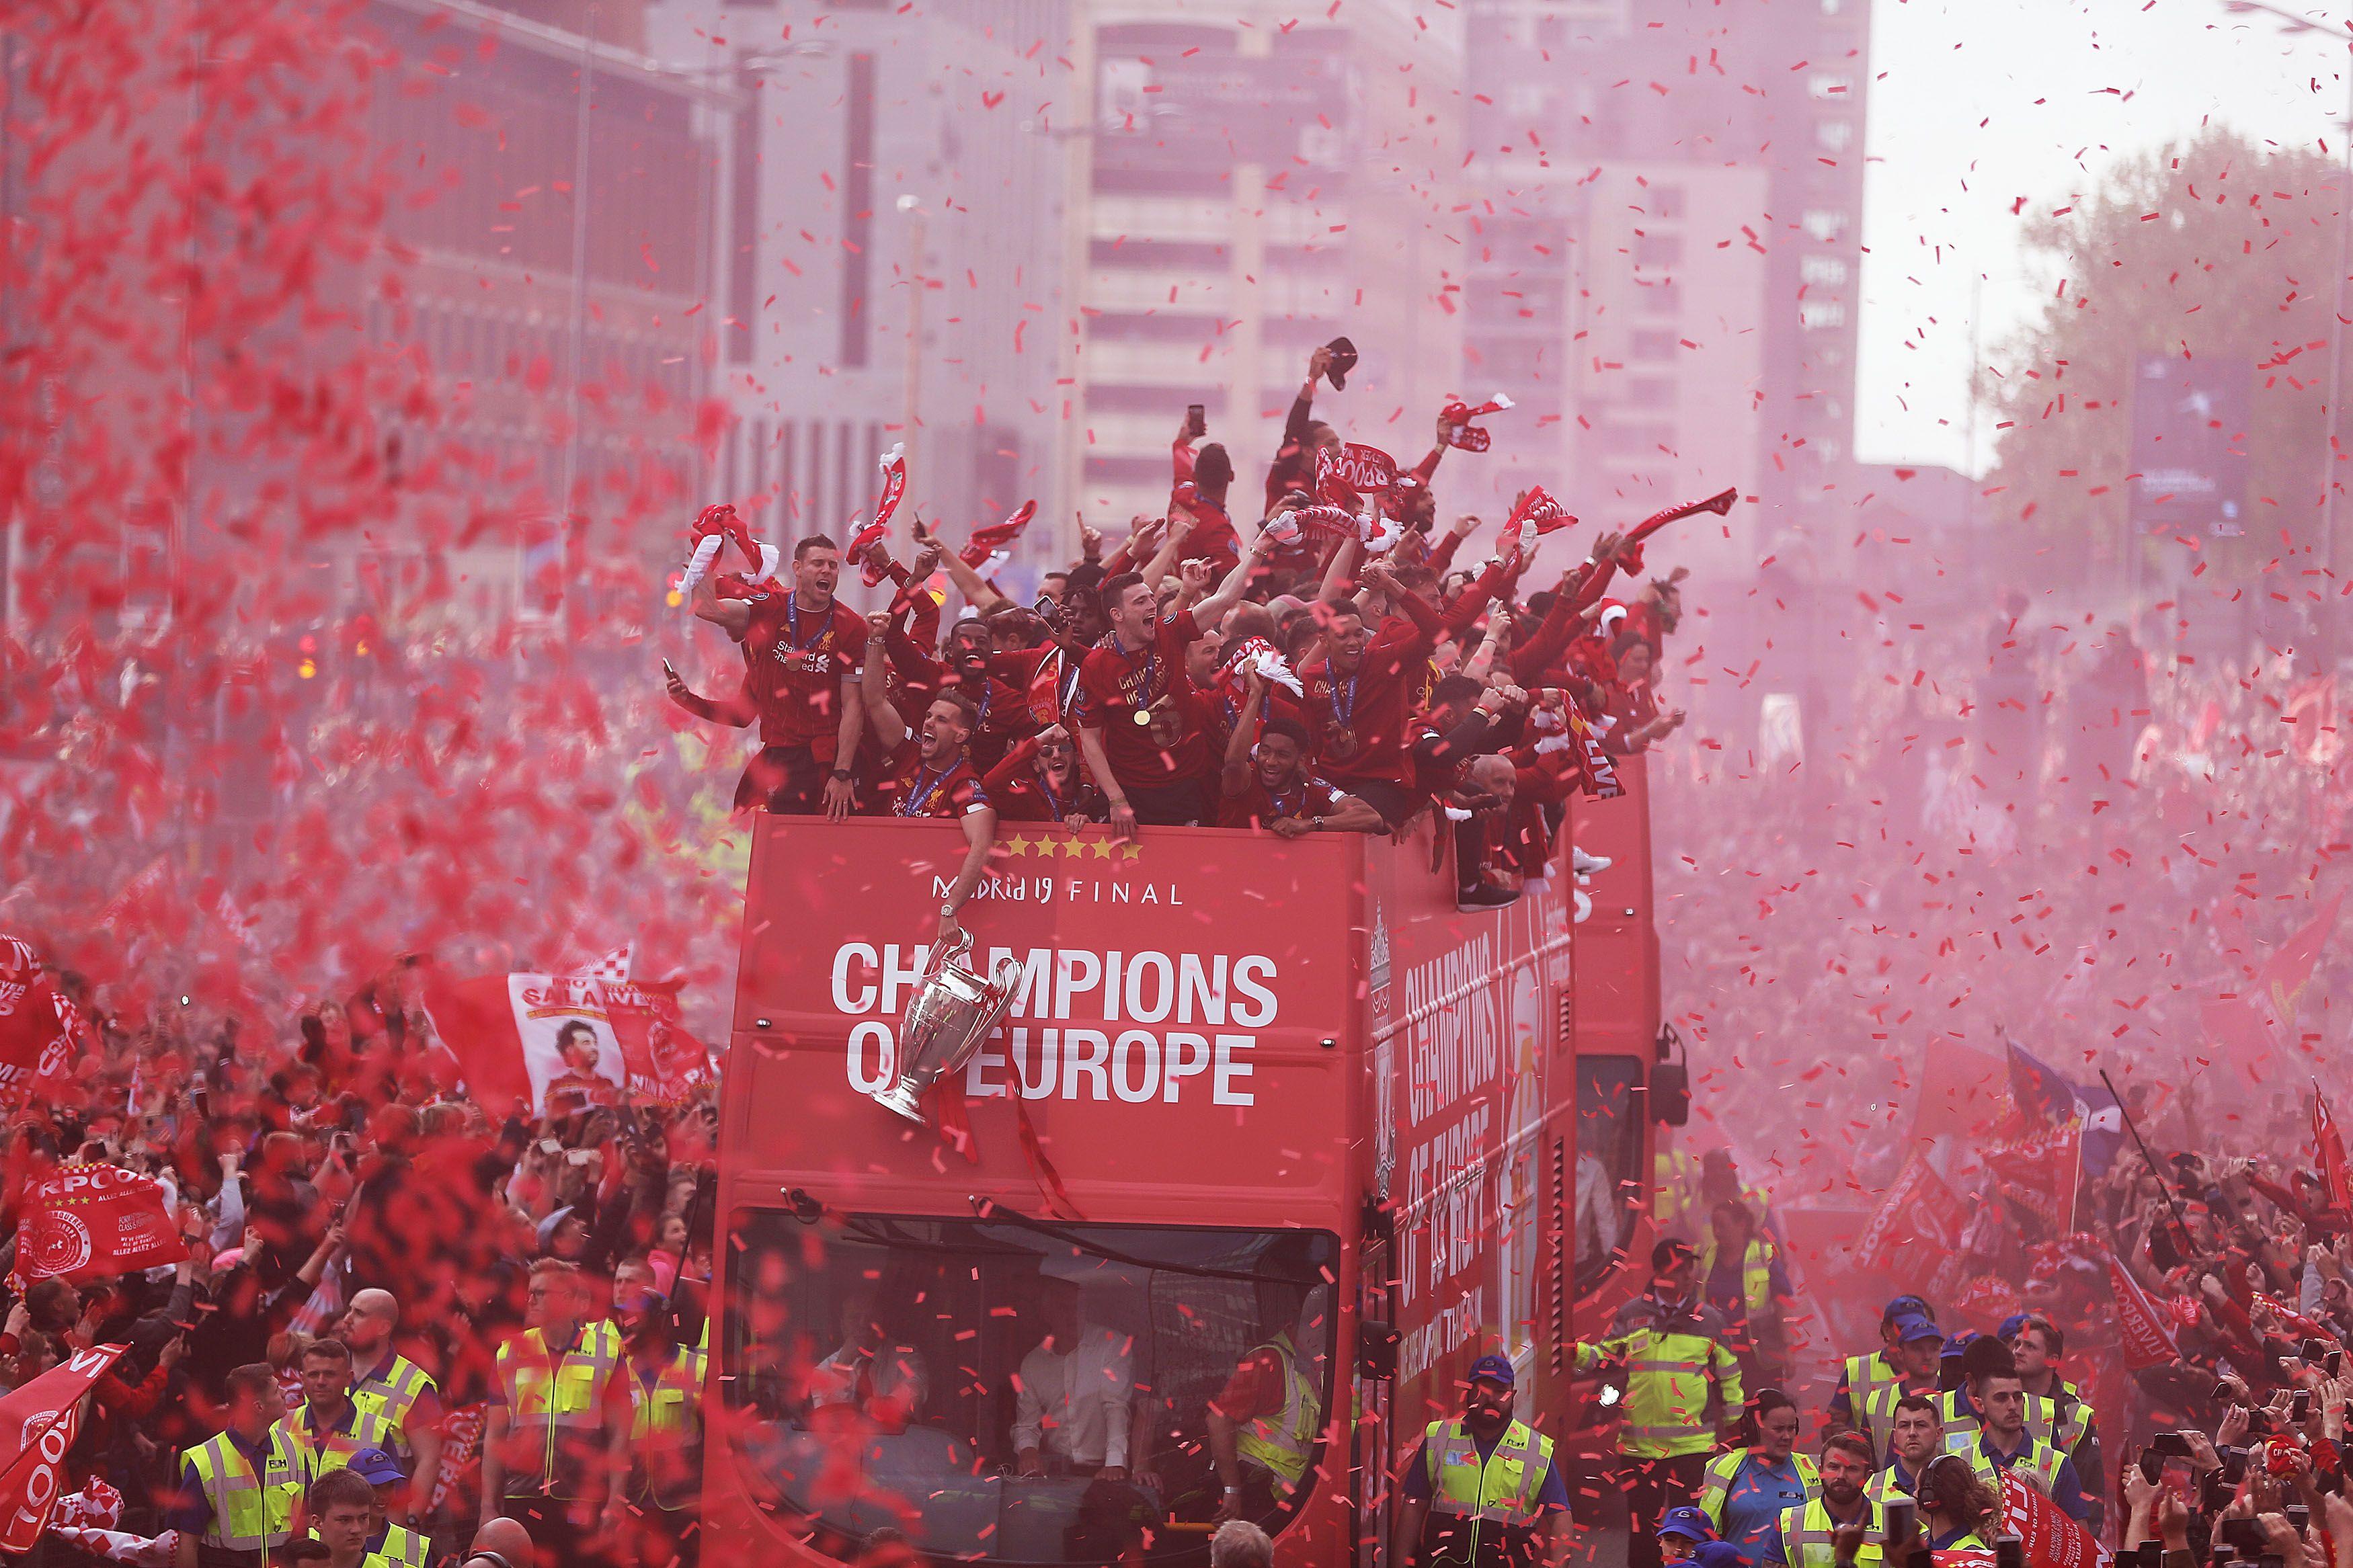 Liverpool championship bus